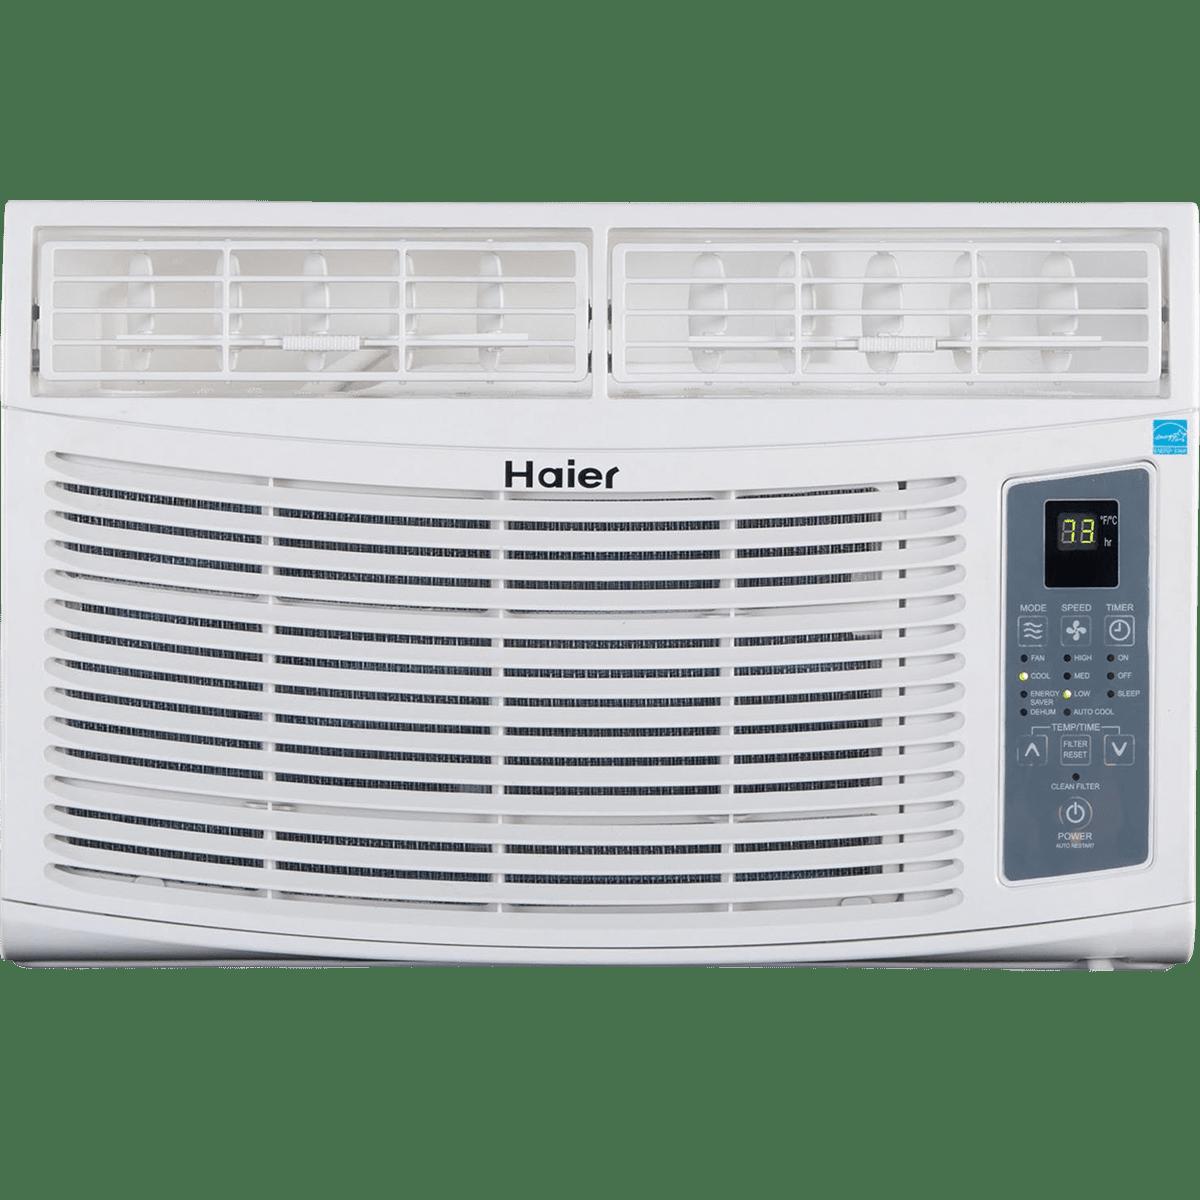 Haier ESA406N 6,000 BTU Window Air Conditioner ha5707